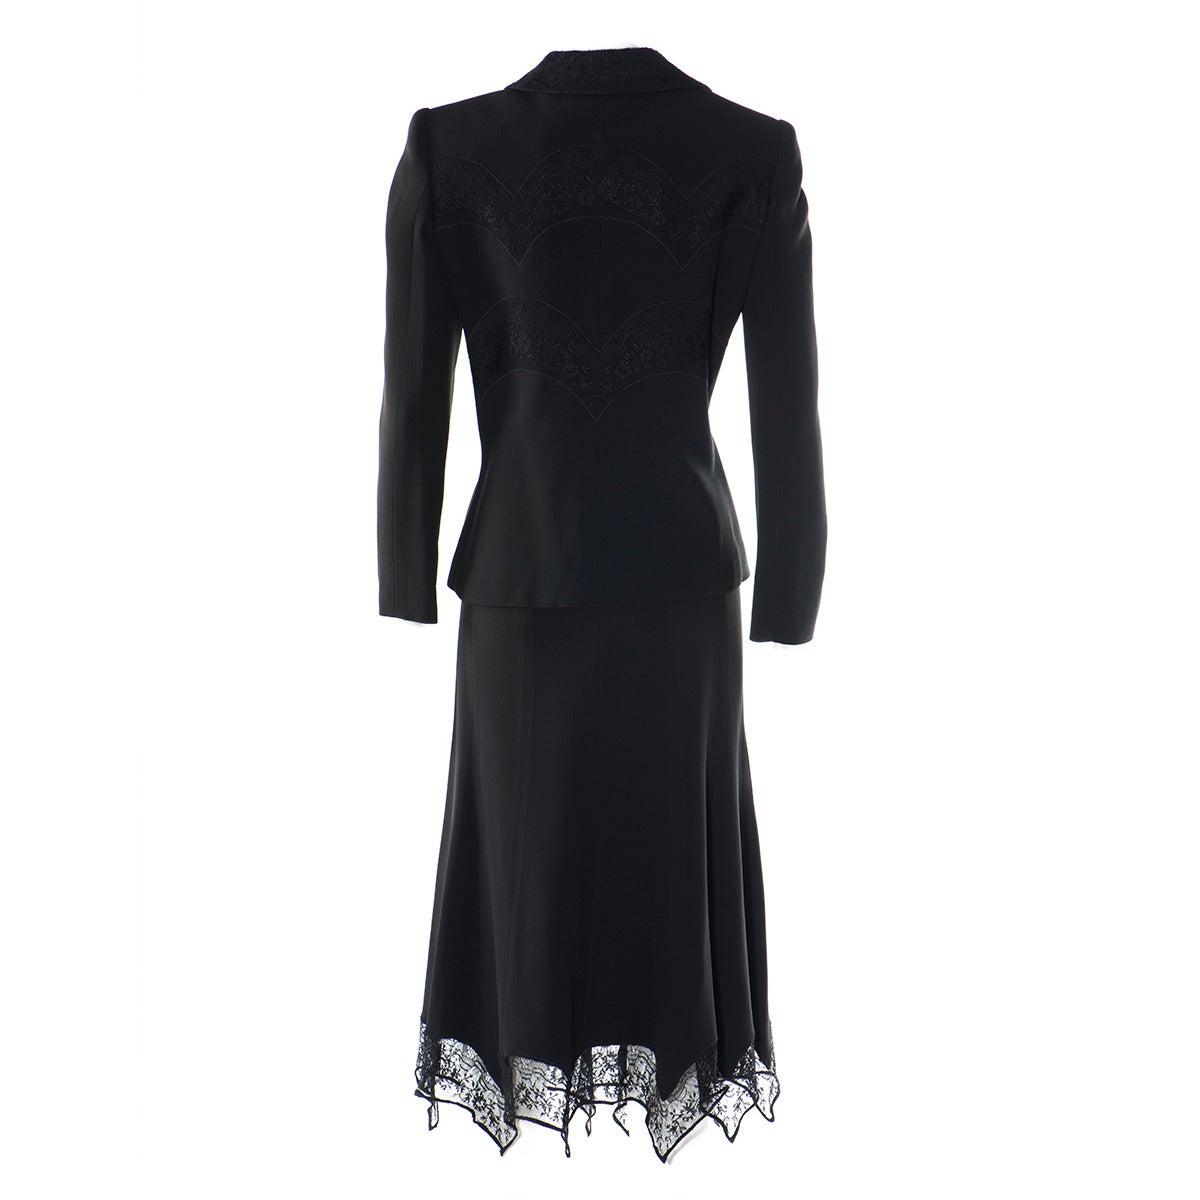 Gai Mattiolo Couture Black Lace and Viscose Skirt Suit 2